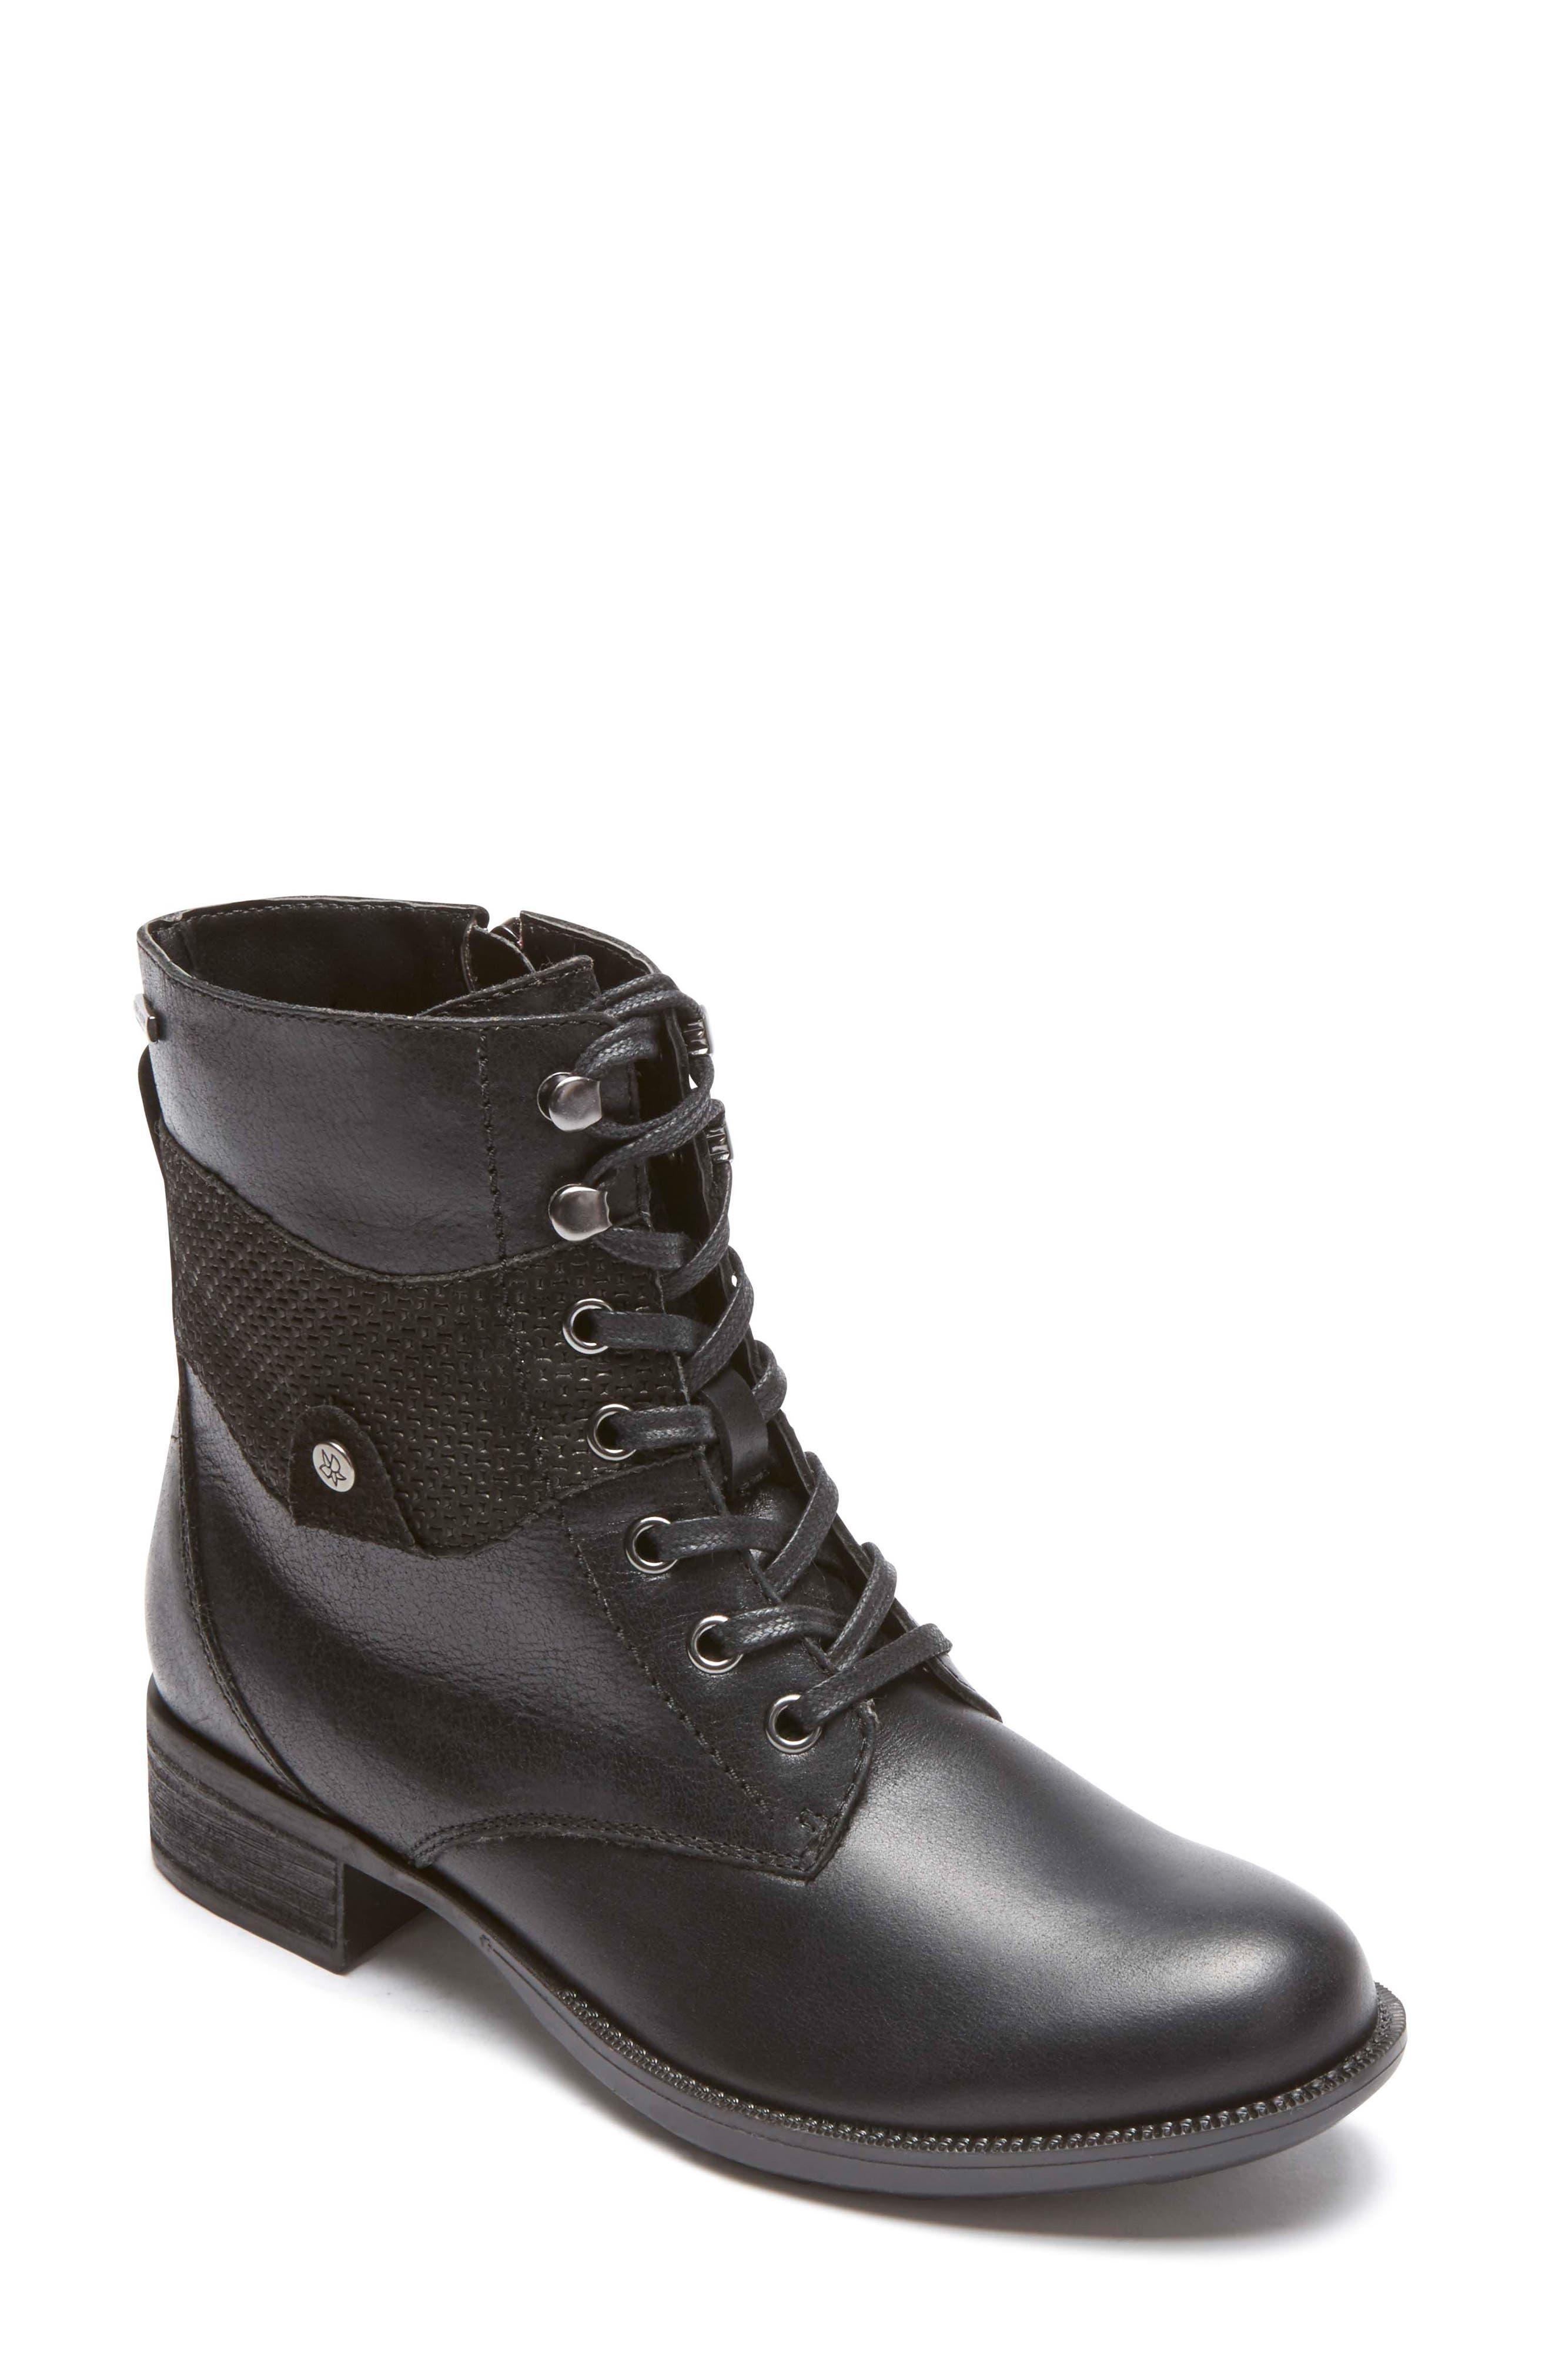 Copley Waterproof Combat Boot,                         Main,                         color, Black Leather